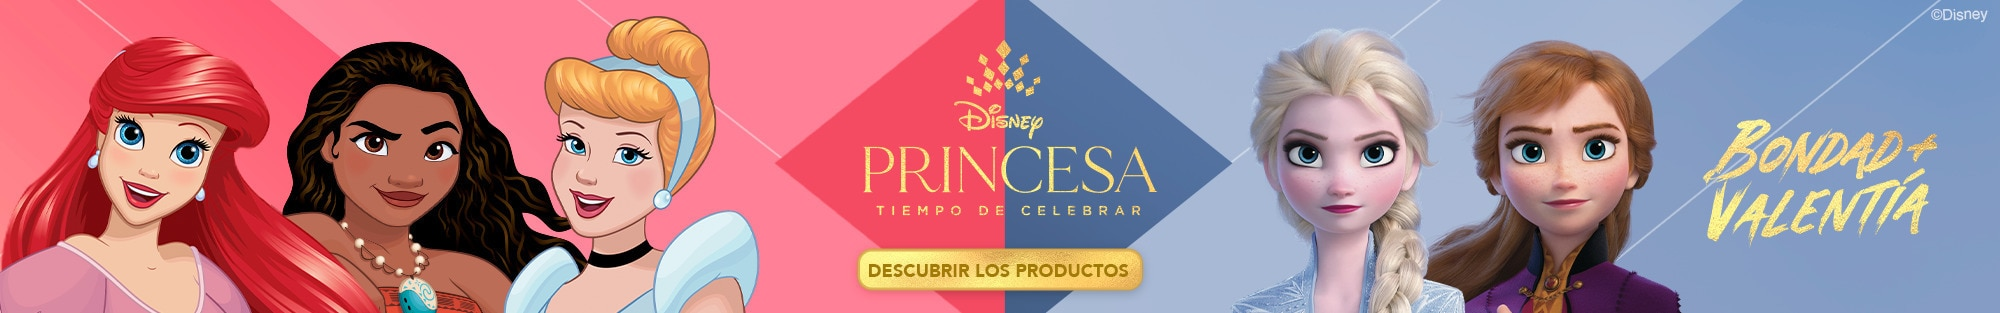 Mid_ShopDisney_Apr21_Princesas Ebooks Home Ebooks MX